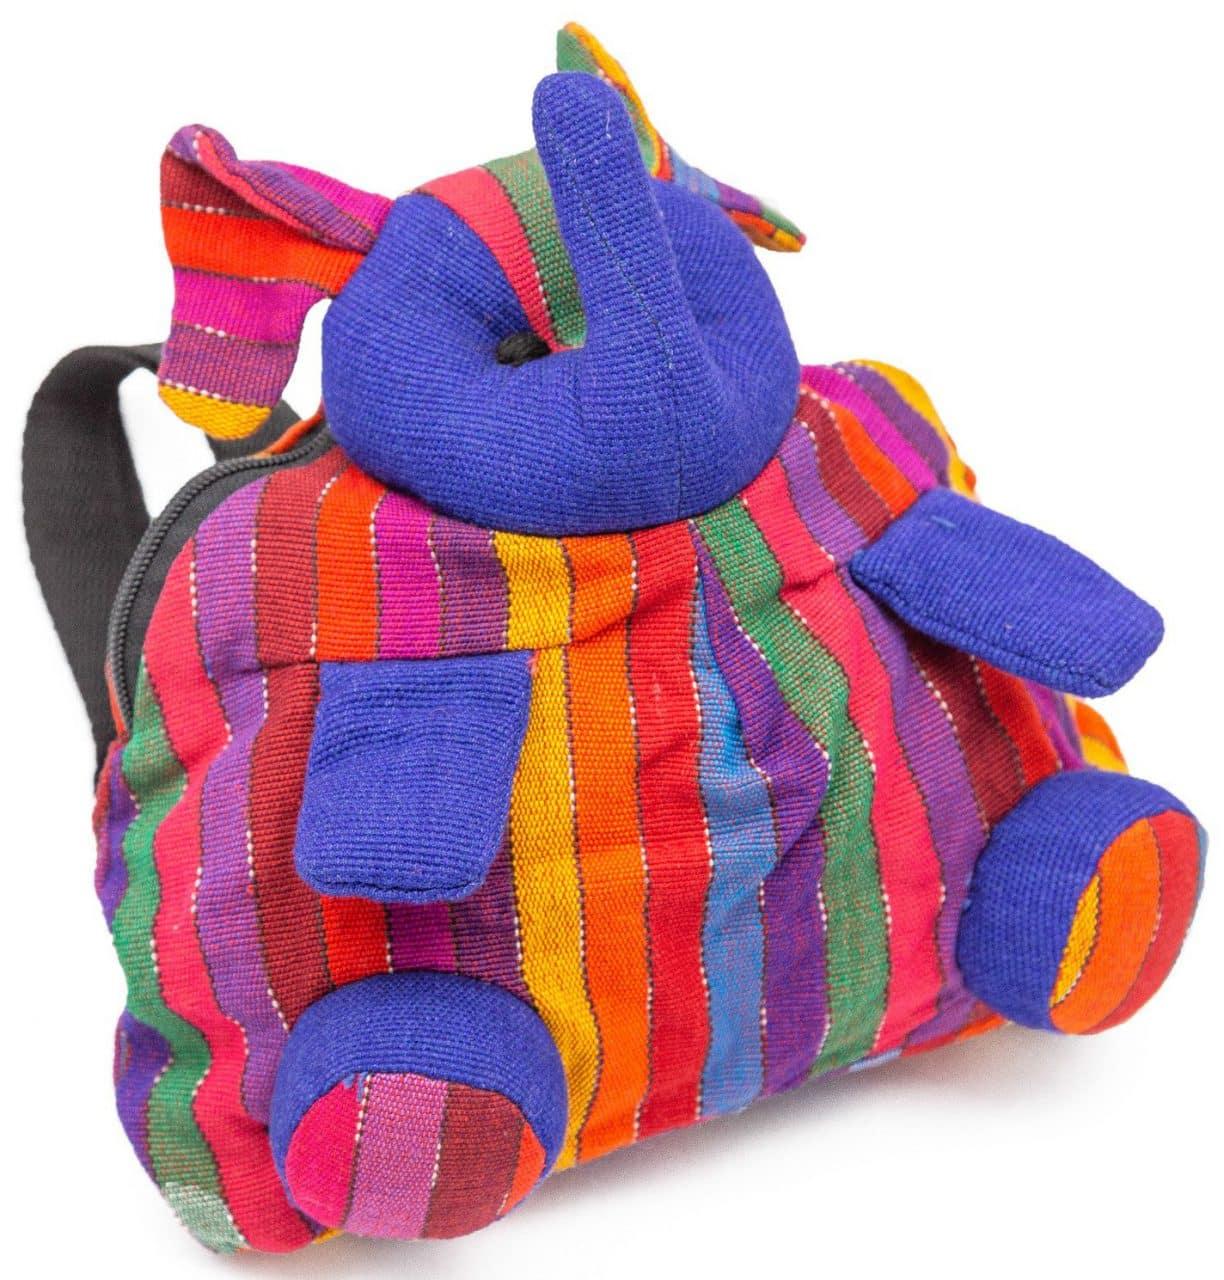 Colorful Elephant Backpack